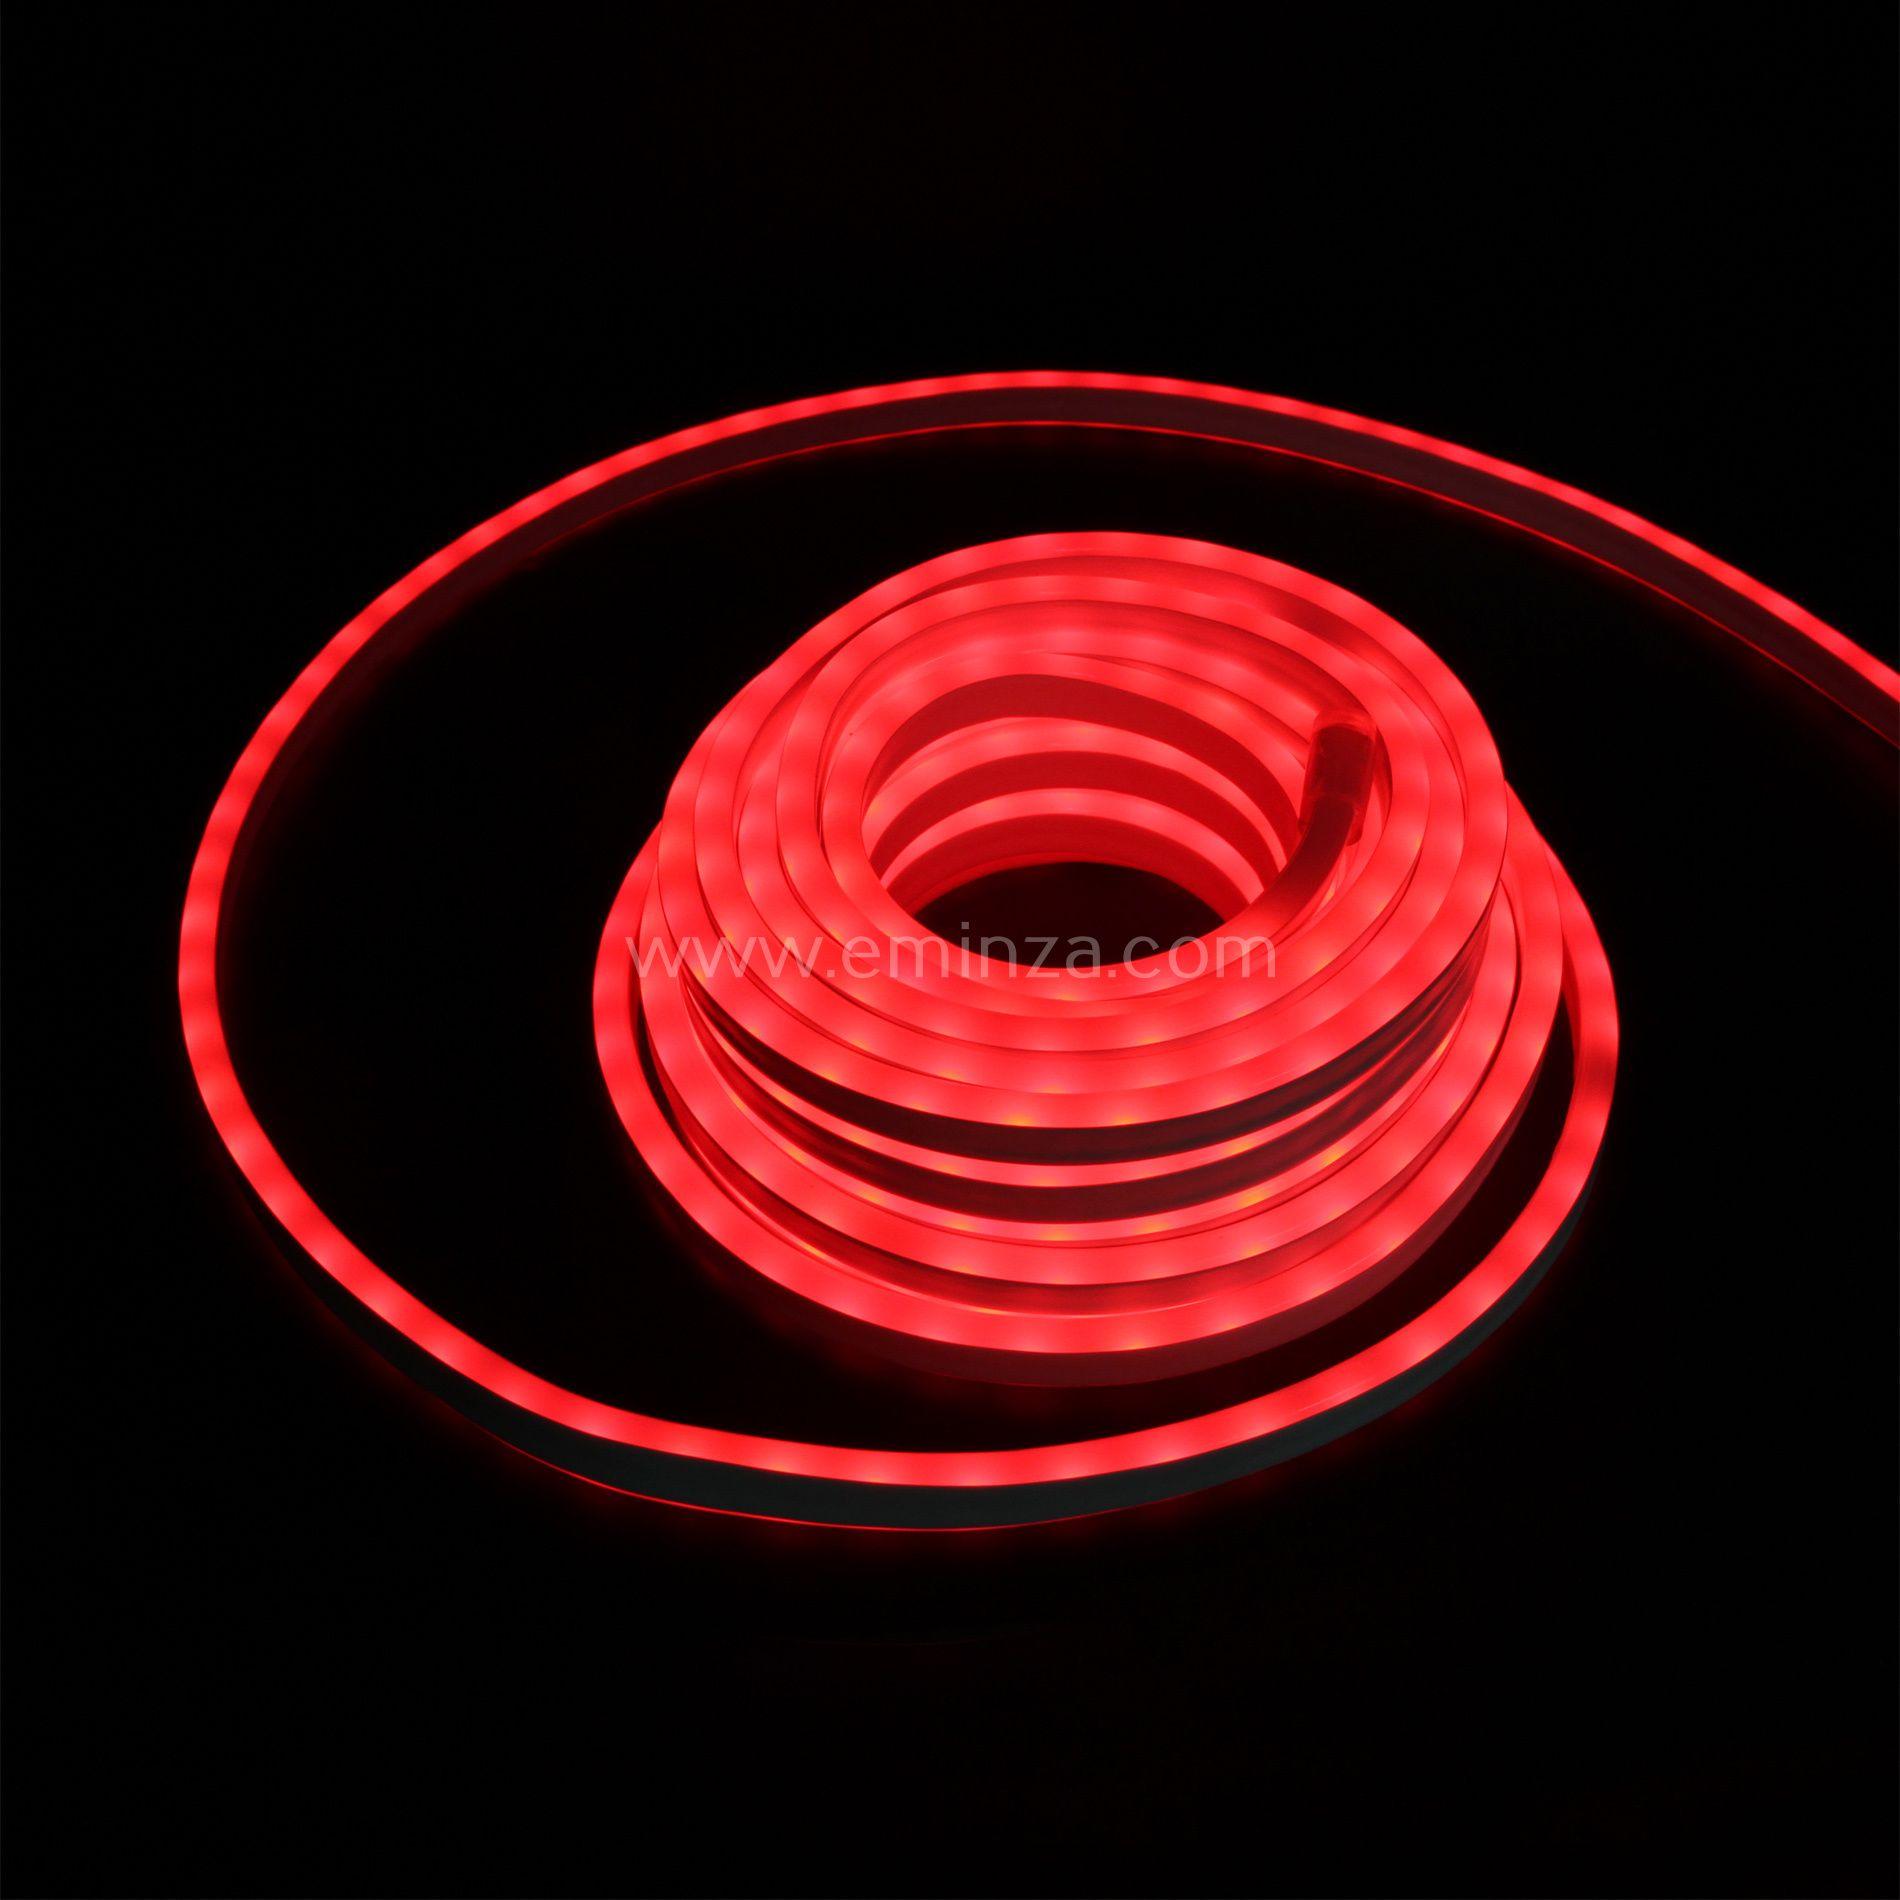 ruban lumineux led free m led ruban fil ag lr batterie guirlande lumineuse avec bouchon de with. Black Bedroom Furniture Sets. Home Design Ideas